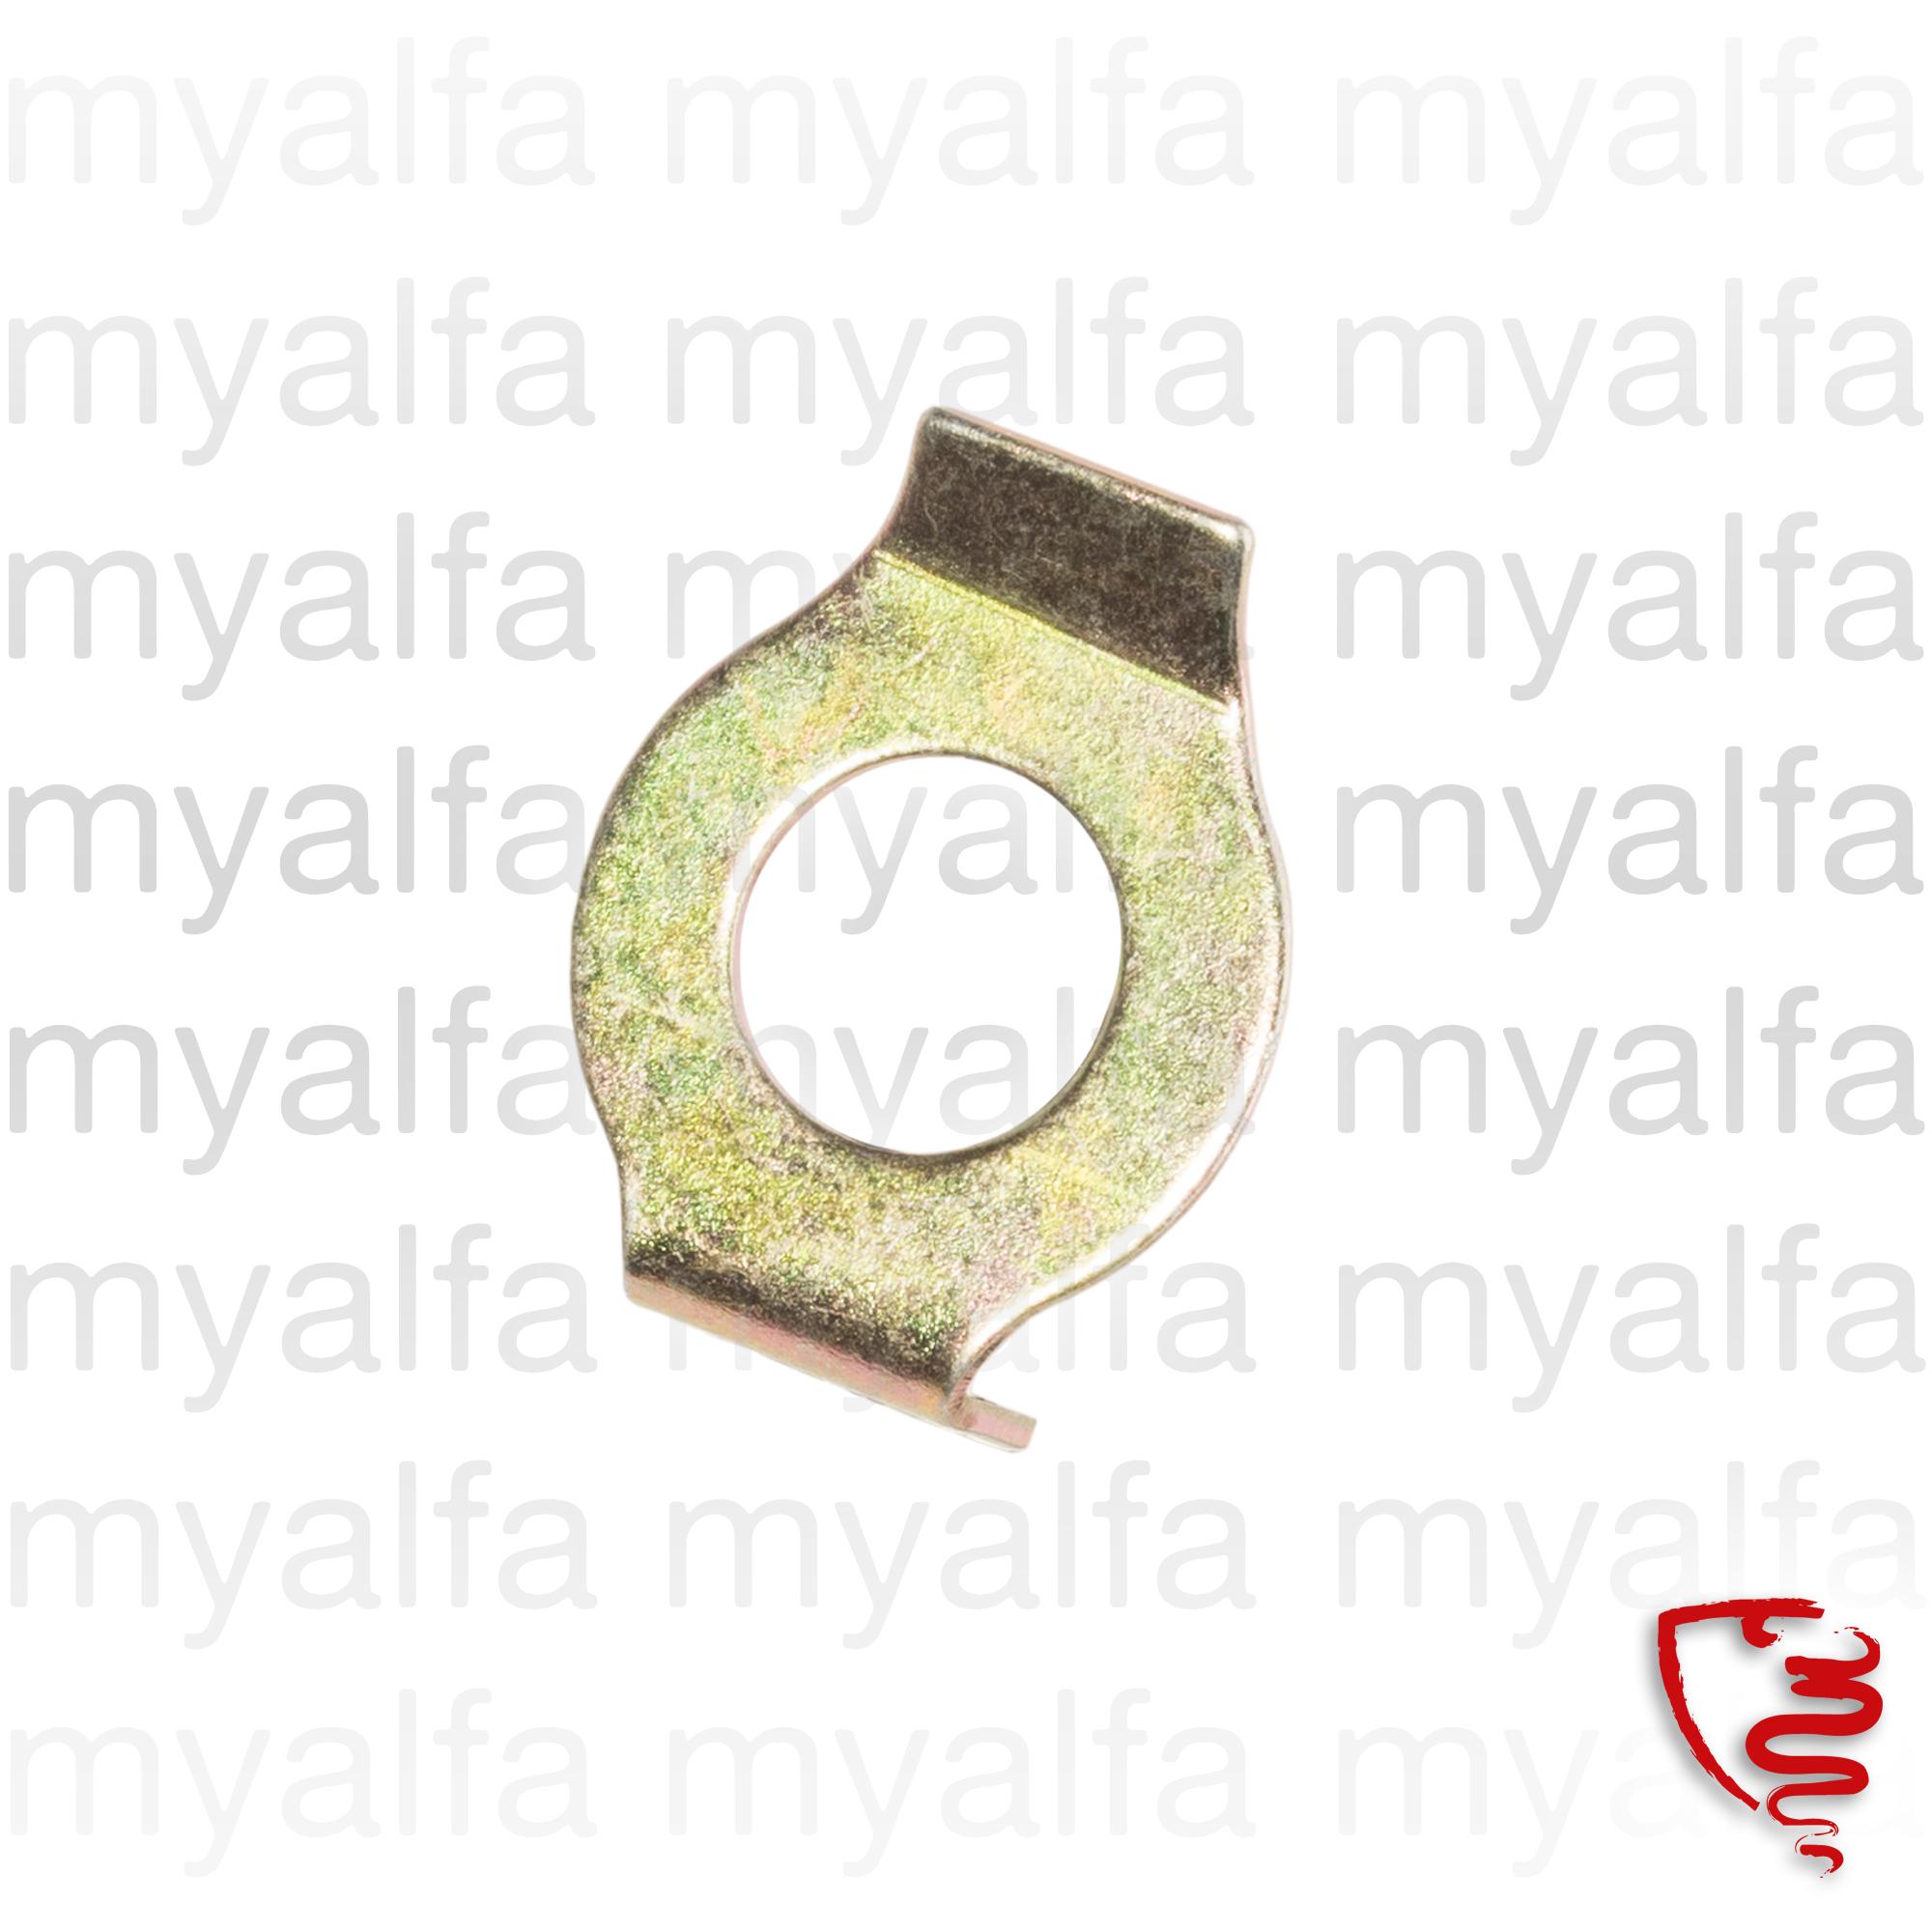 Brake motor for 105/115, Engine, Engine Block, Crankshaft/Bearing